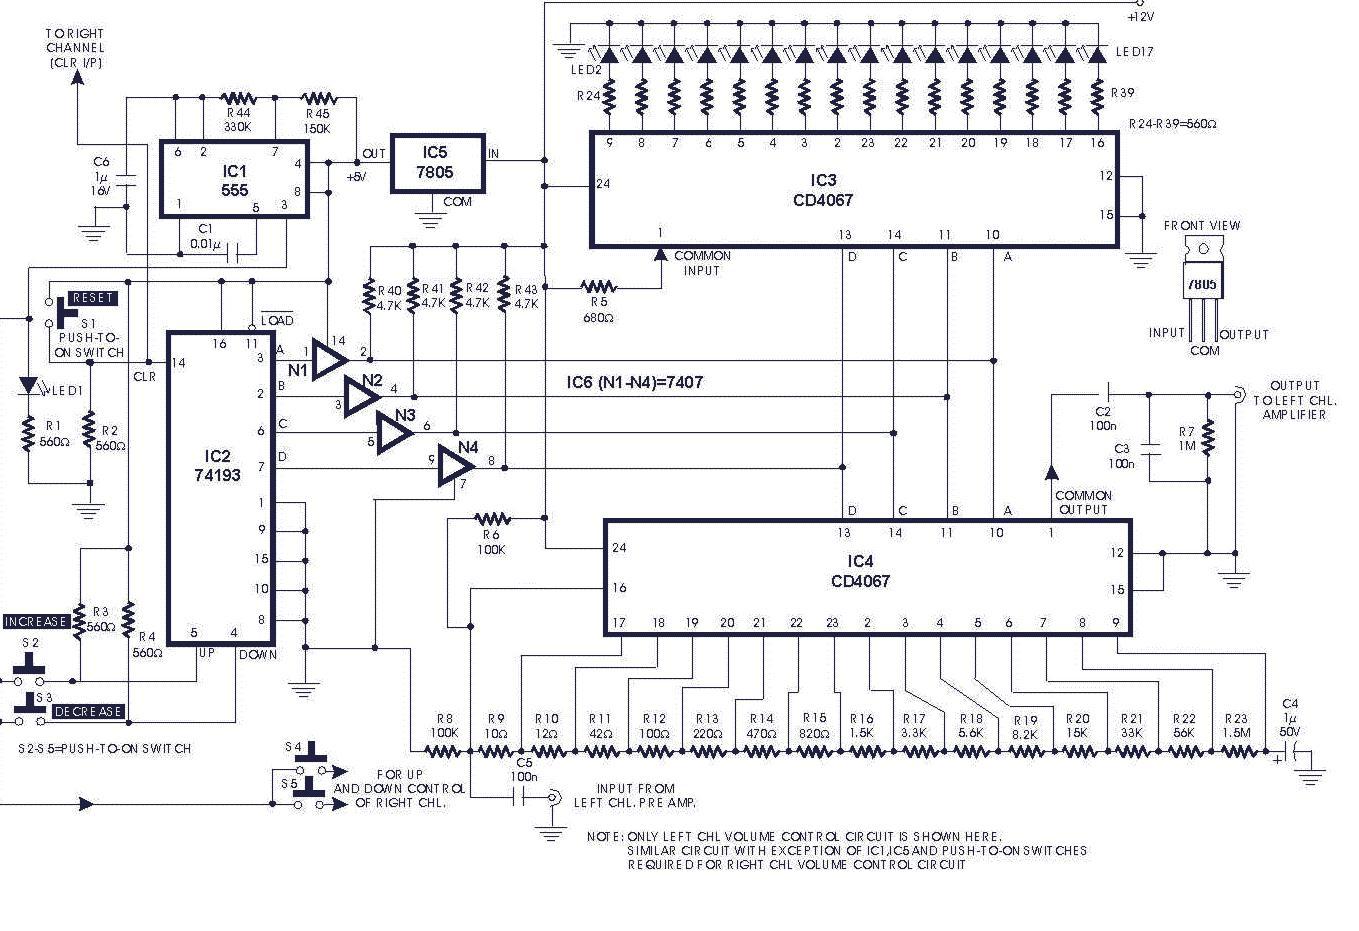 Stupendous Digital Volume Control Circuit Diagrams Wiring Cloud Icalpermsplehendilmohammedshrineorg